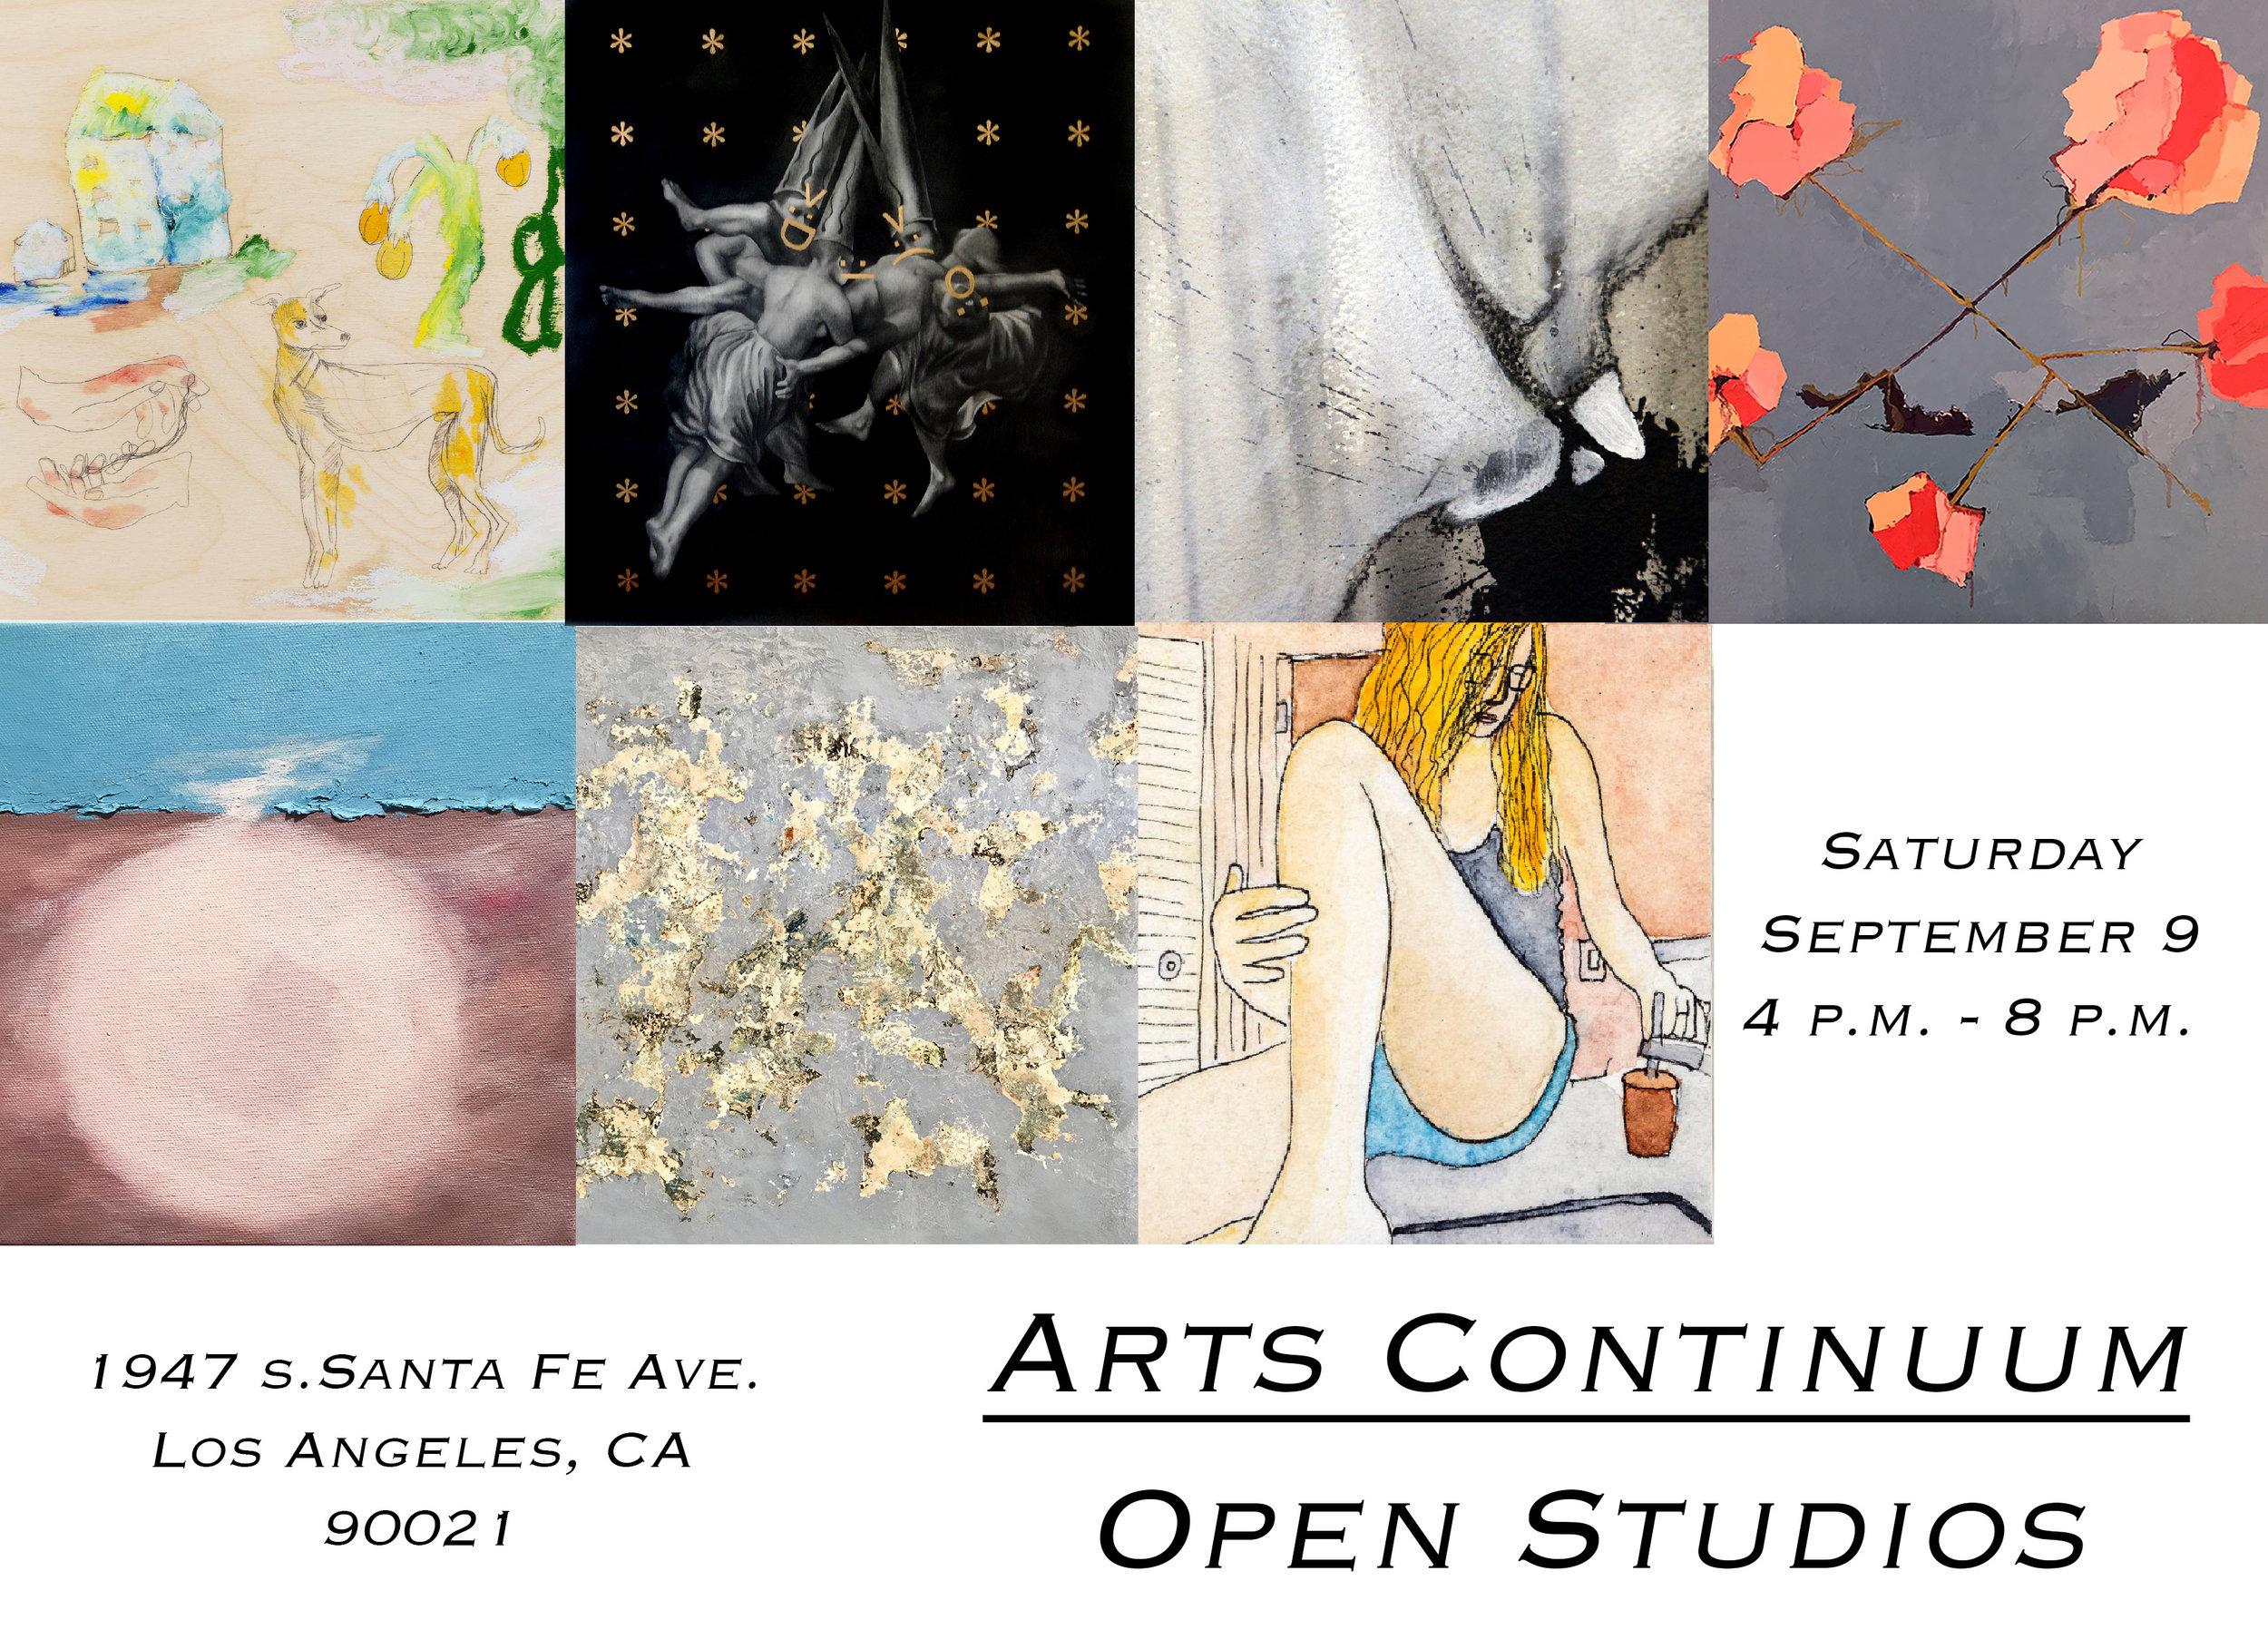 Arts Continuum Open Studios , Arts Continuum, Los Angeles, September 2017